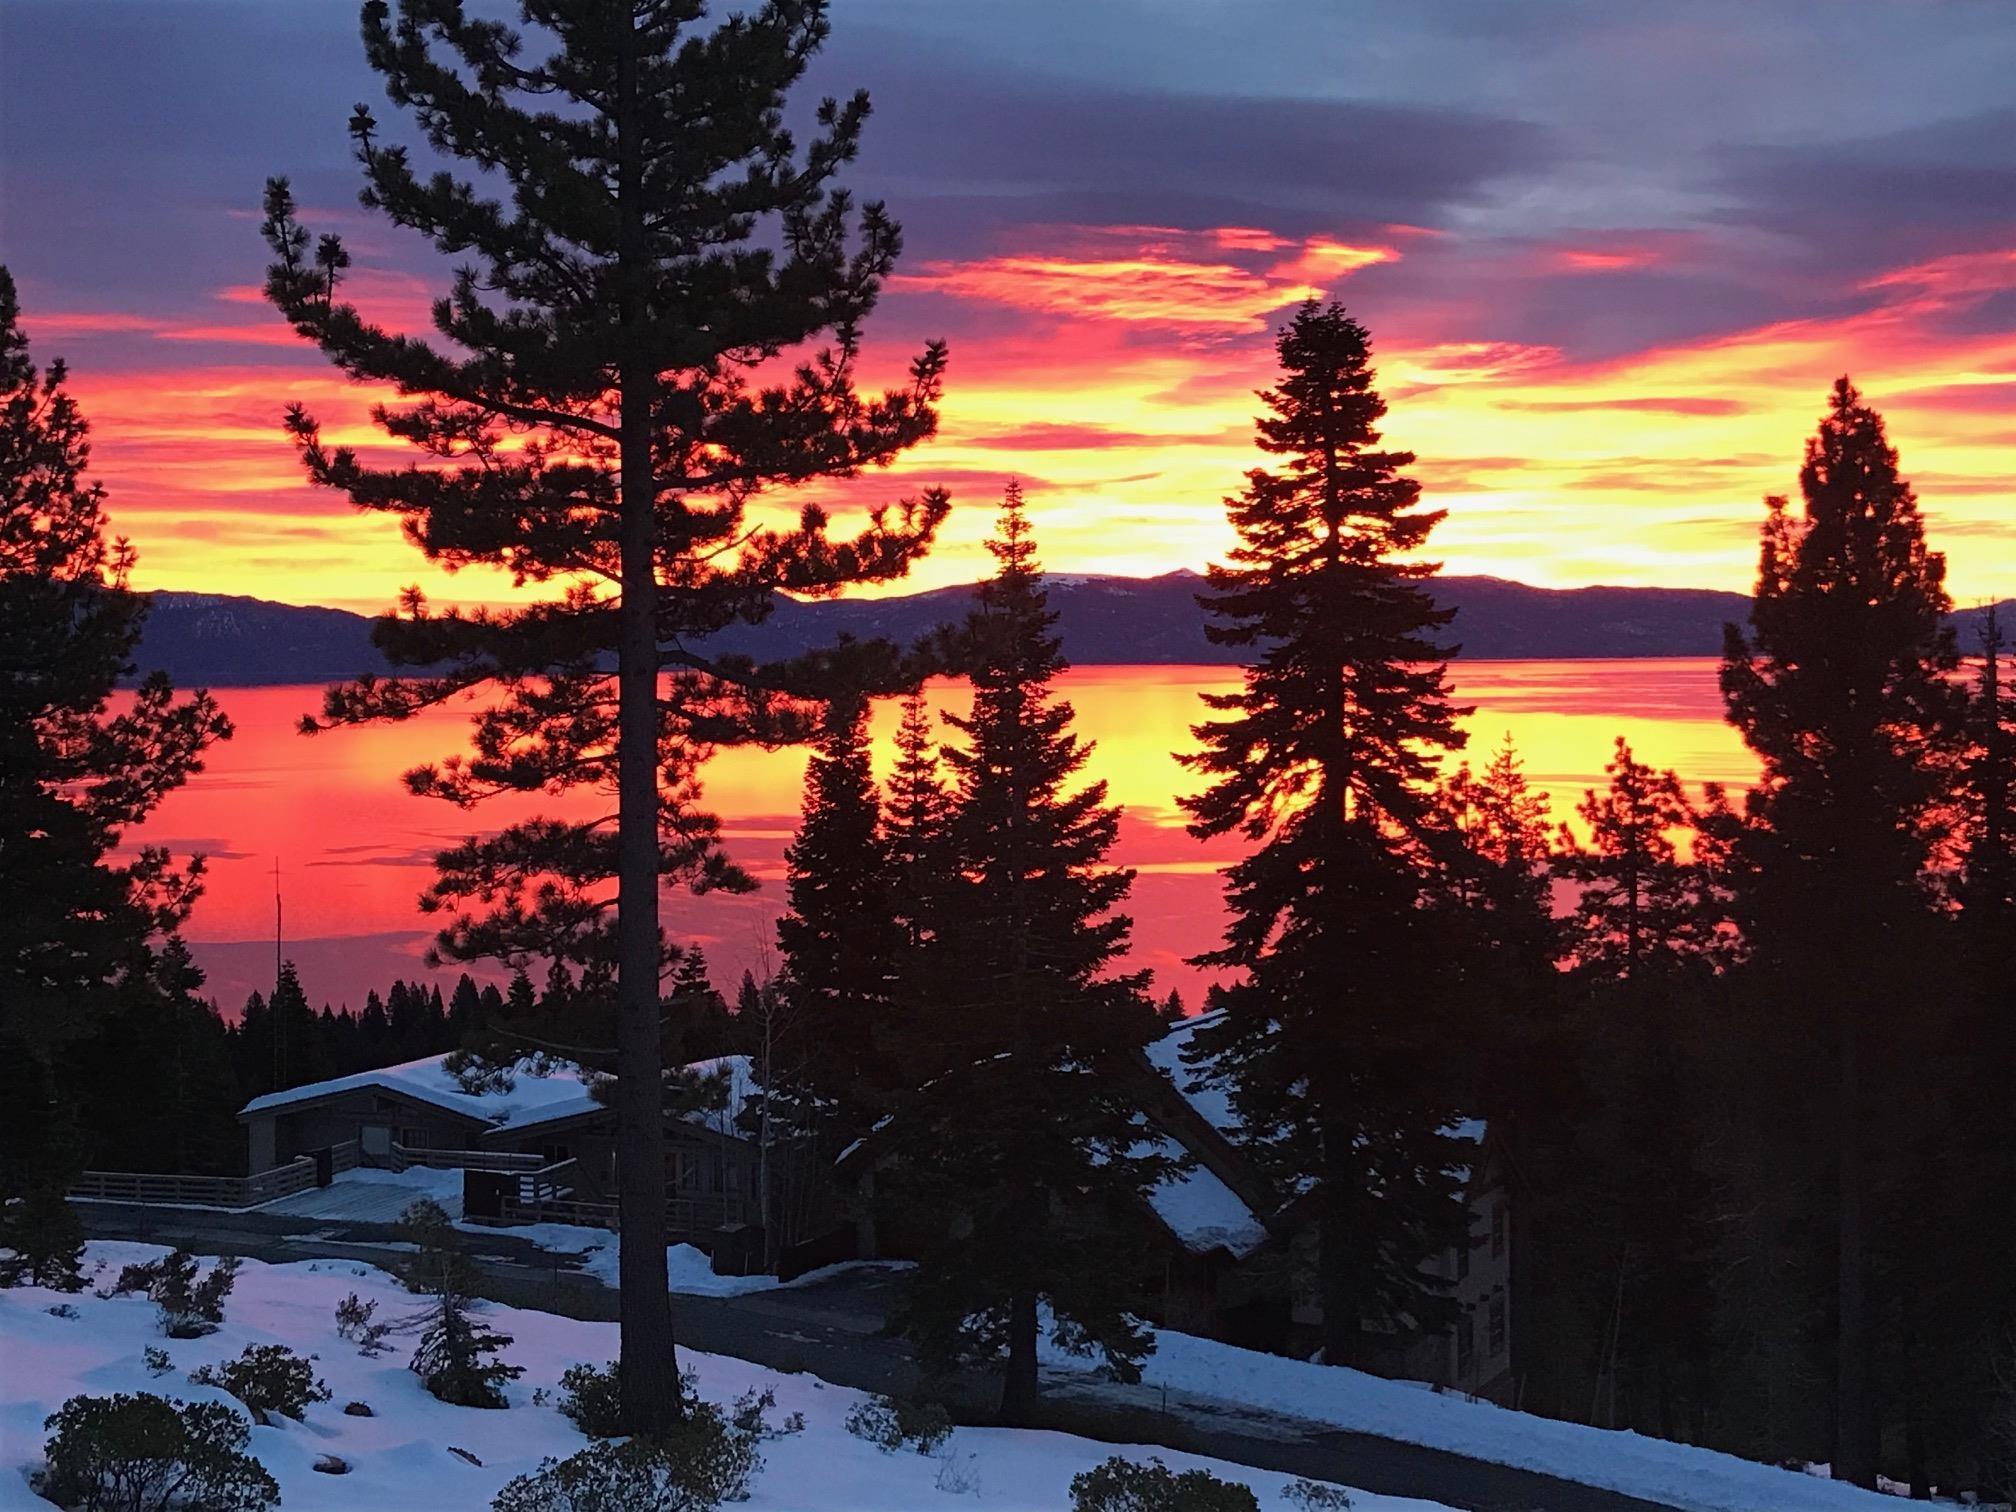 Image for 990 Big Pine Drive, Tahoe City, CA 96145-0000